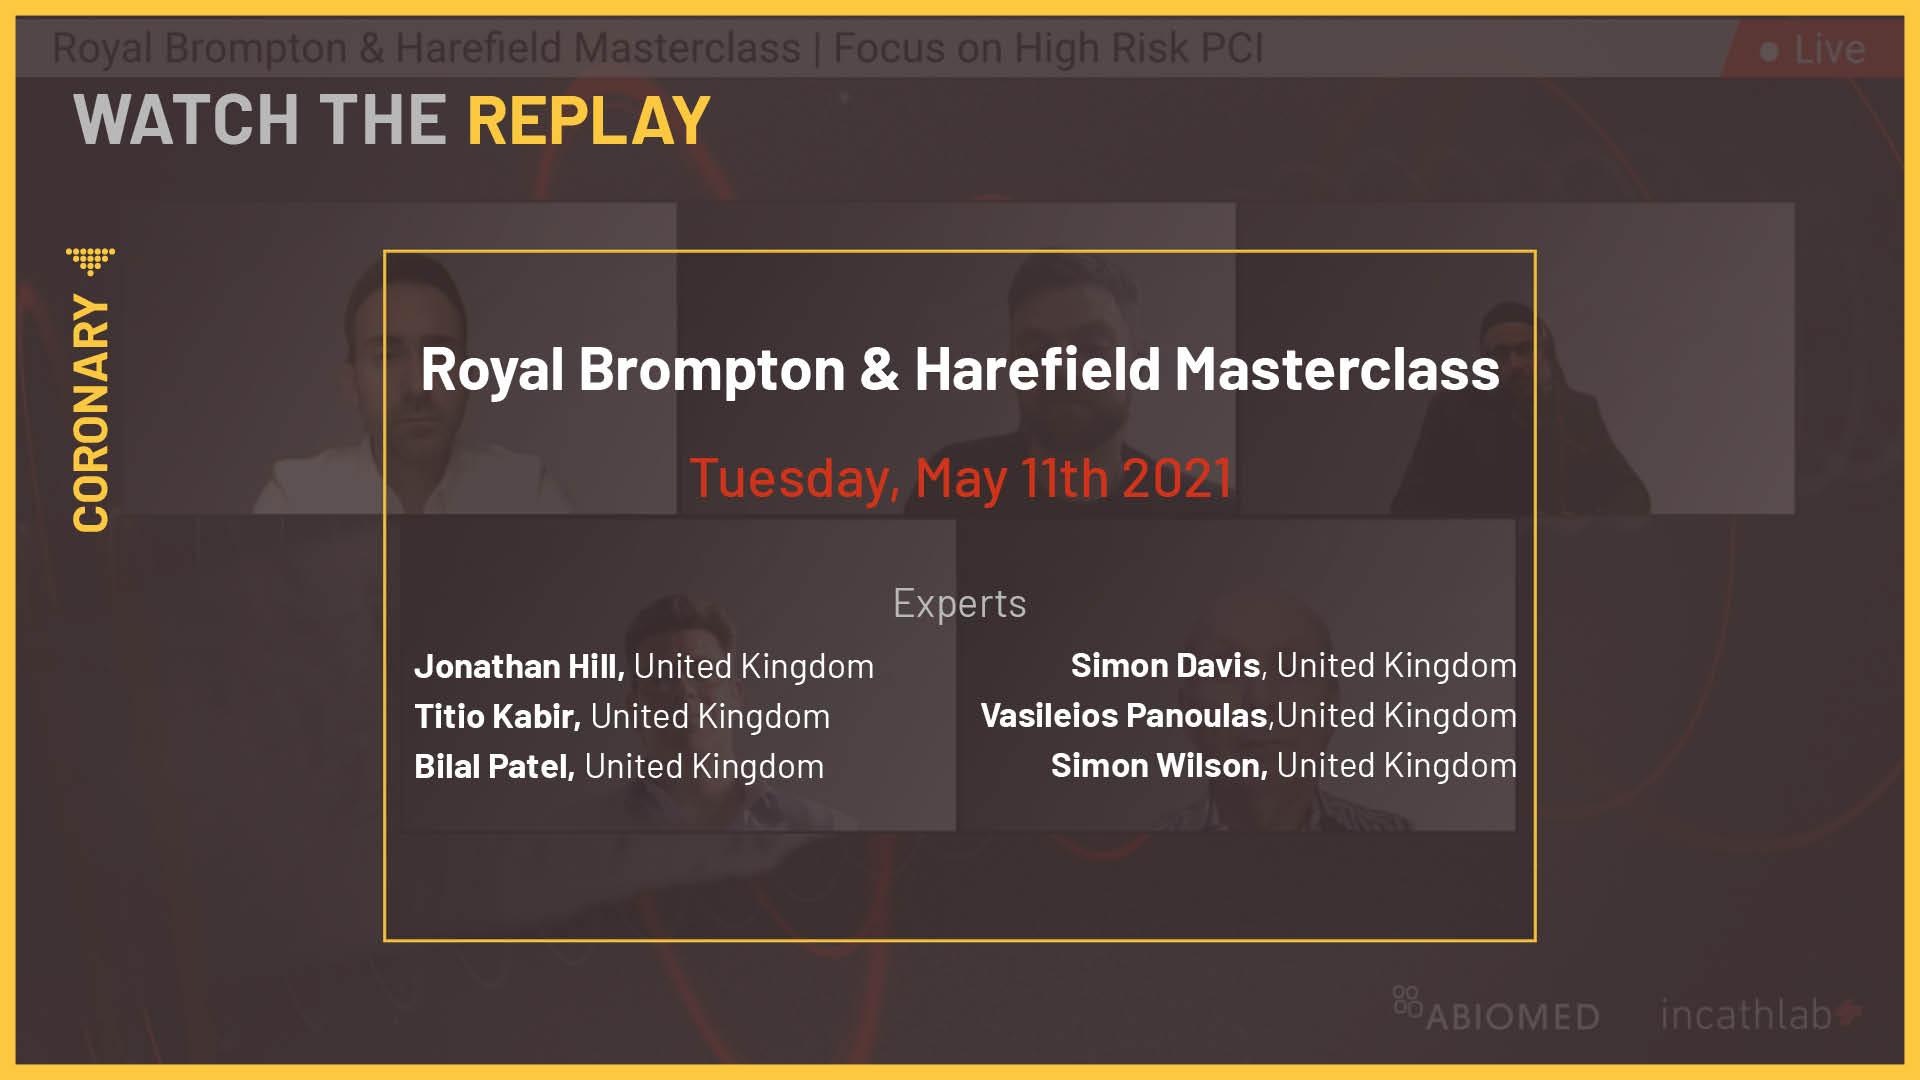 Royal Brompton & Harefield Masterclass